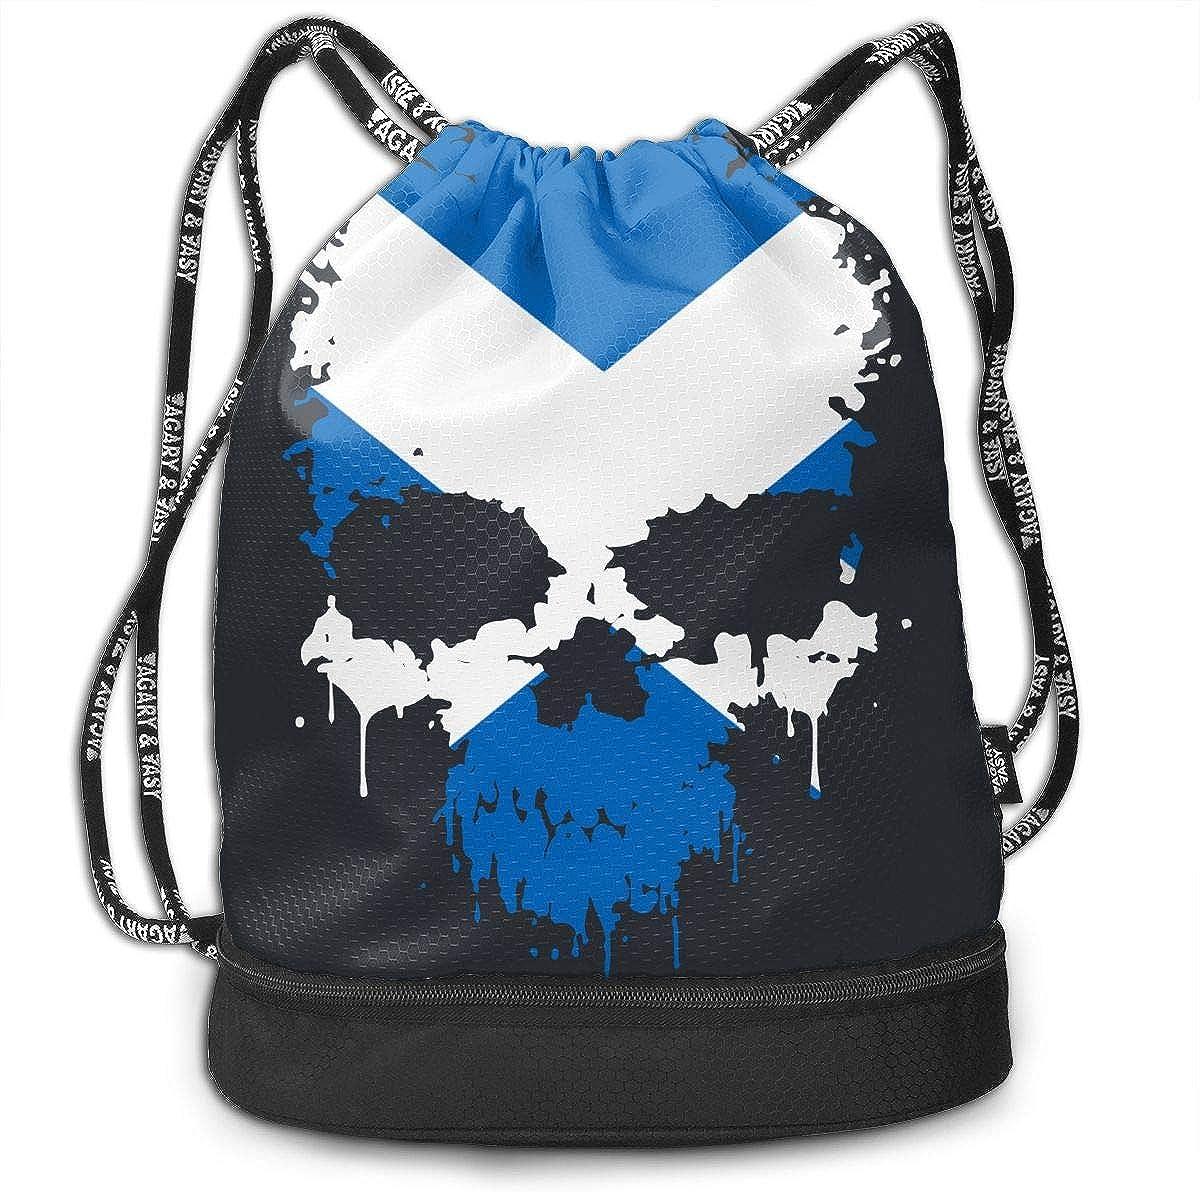 Scotland Flag Splatter Skull Drawstring Bag Multifunctional String Backpack Custom Cinch Backpack Rucksack Gym Bag